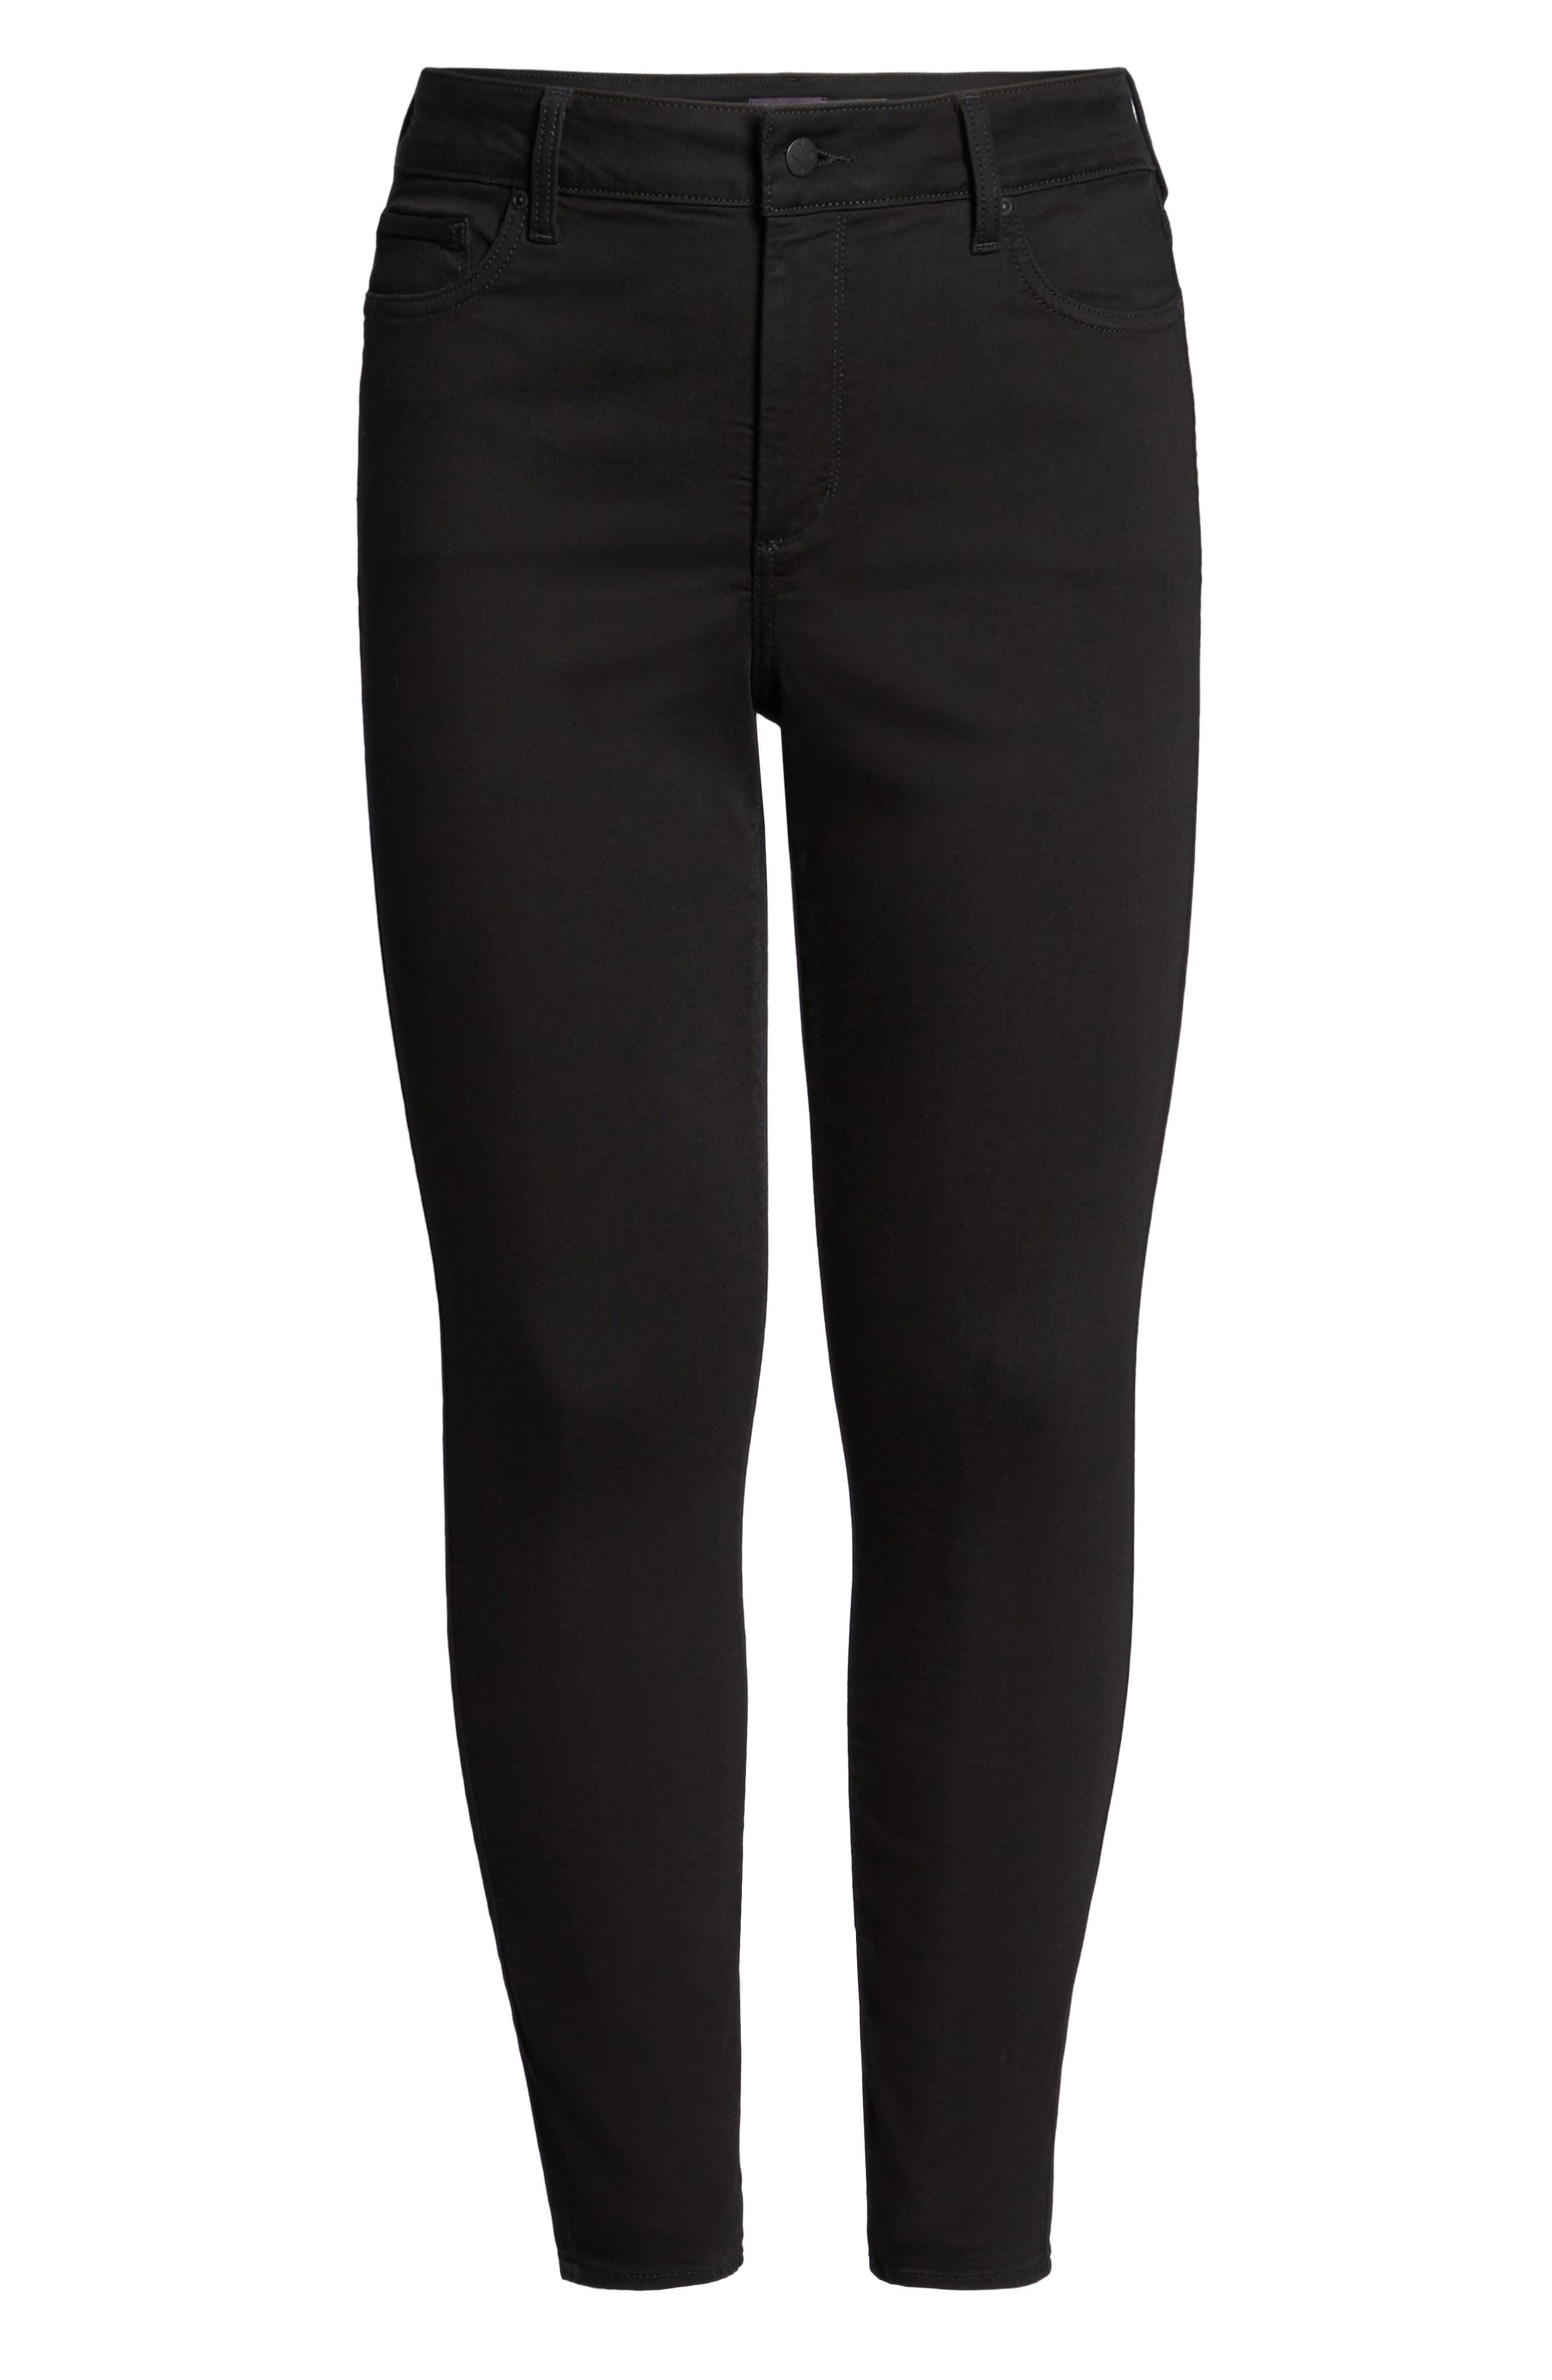 Ami Stretch Skinny Jeans,                             Alternate thumbnail 6, color,                             Black